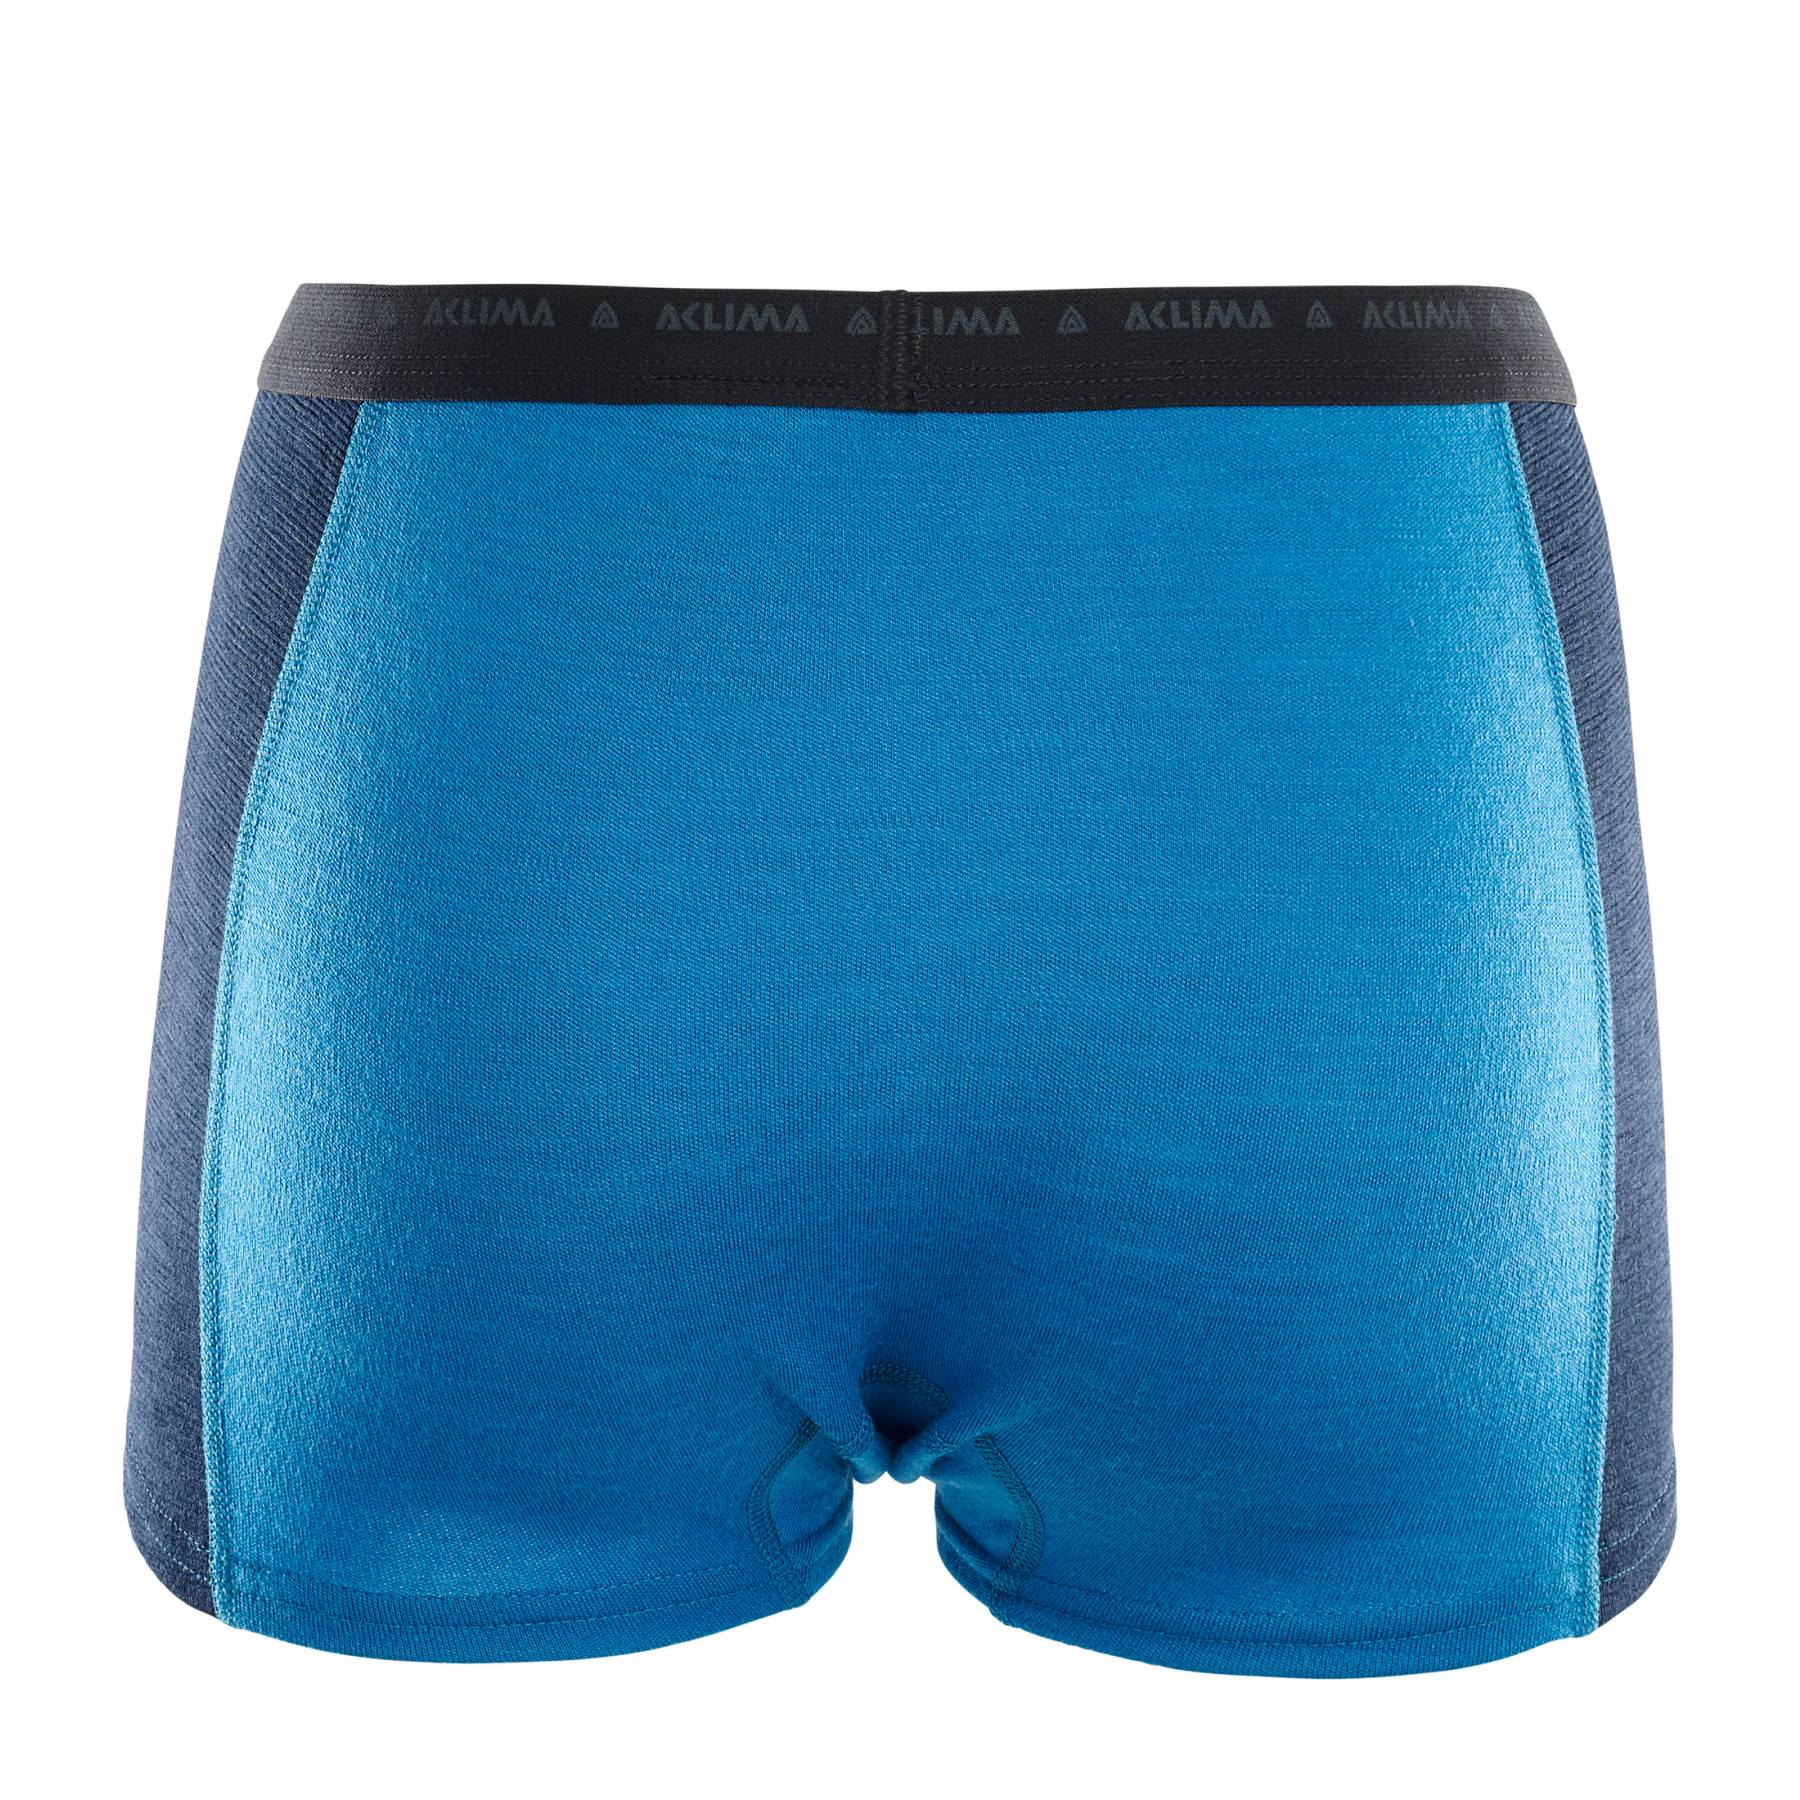 Image of Aclima Warmwool Hipster Women's Shorts - blue sapphire/navy blazer